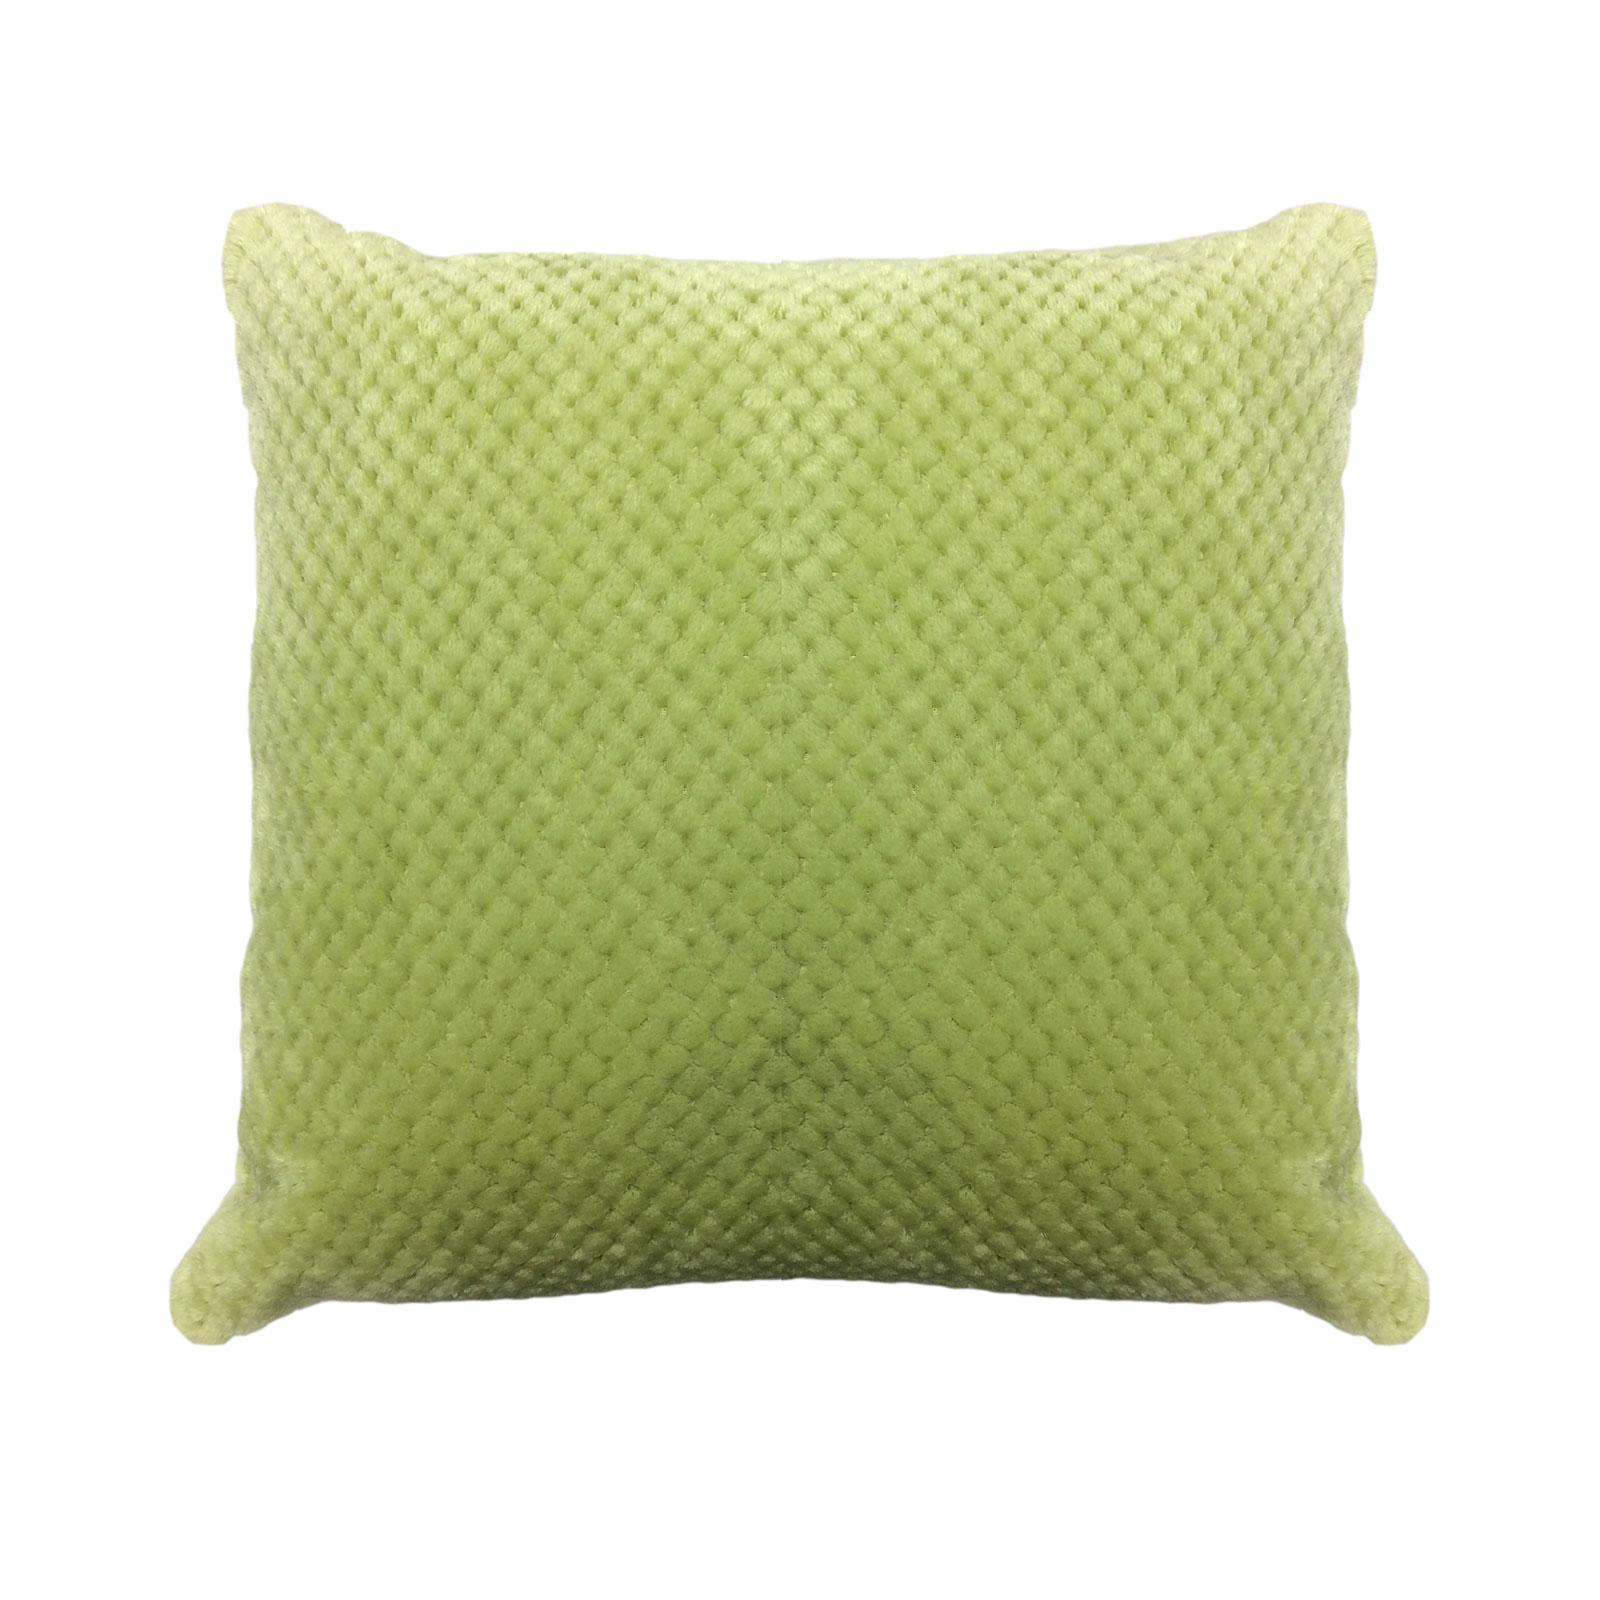 Large Sofa Pillow Covers Aliexpress Buy Large Cushion  : waffle throw pillowcase lime from www.honansantiques.com size 1600 x 1600 jpeg 238kB